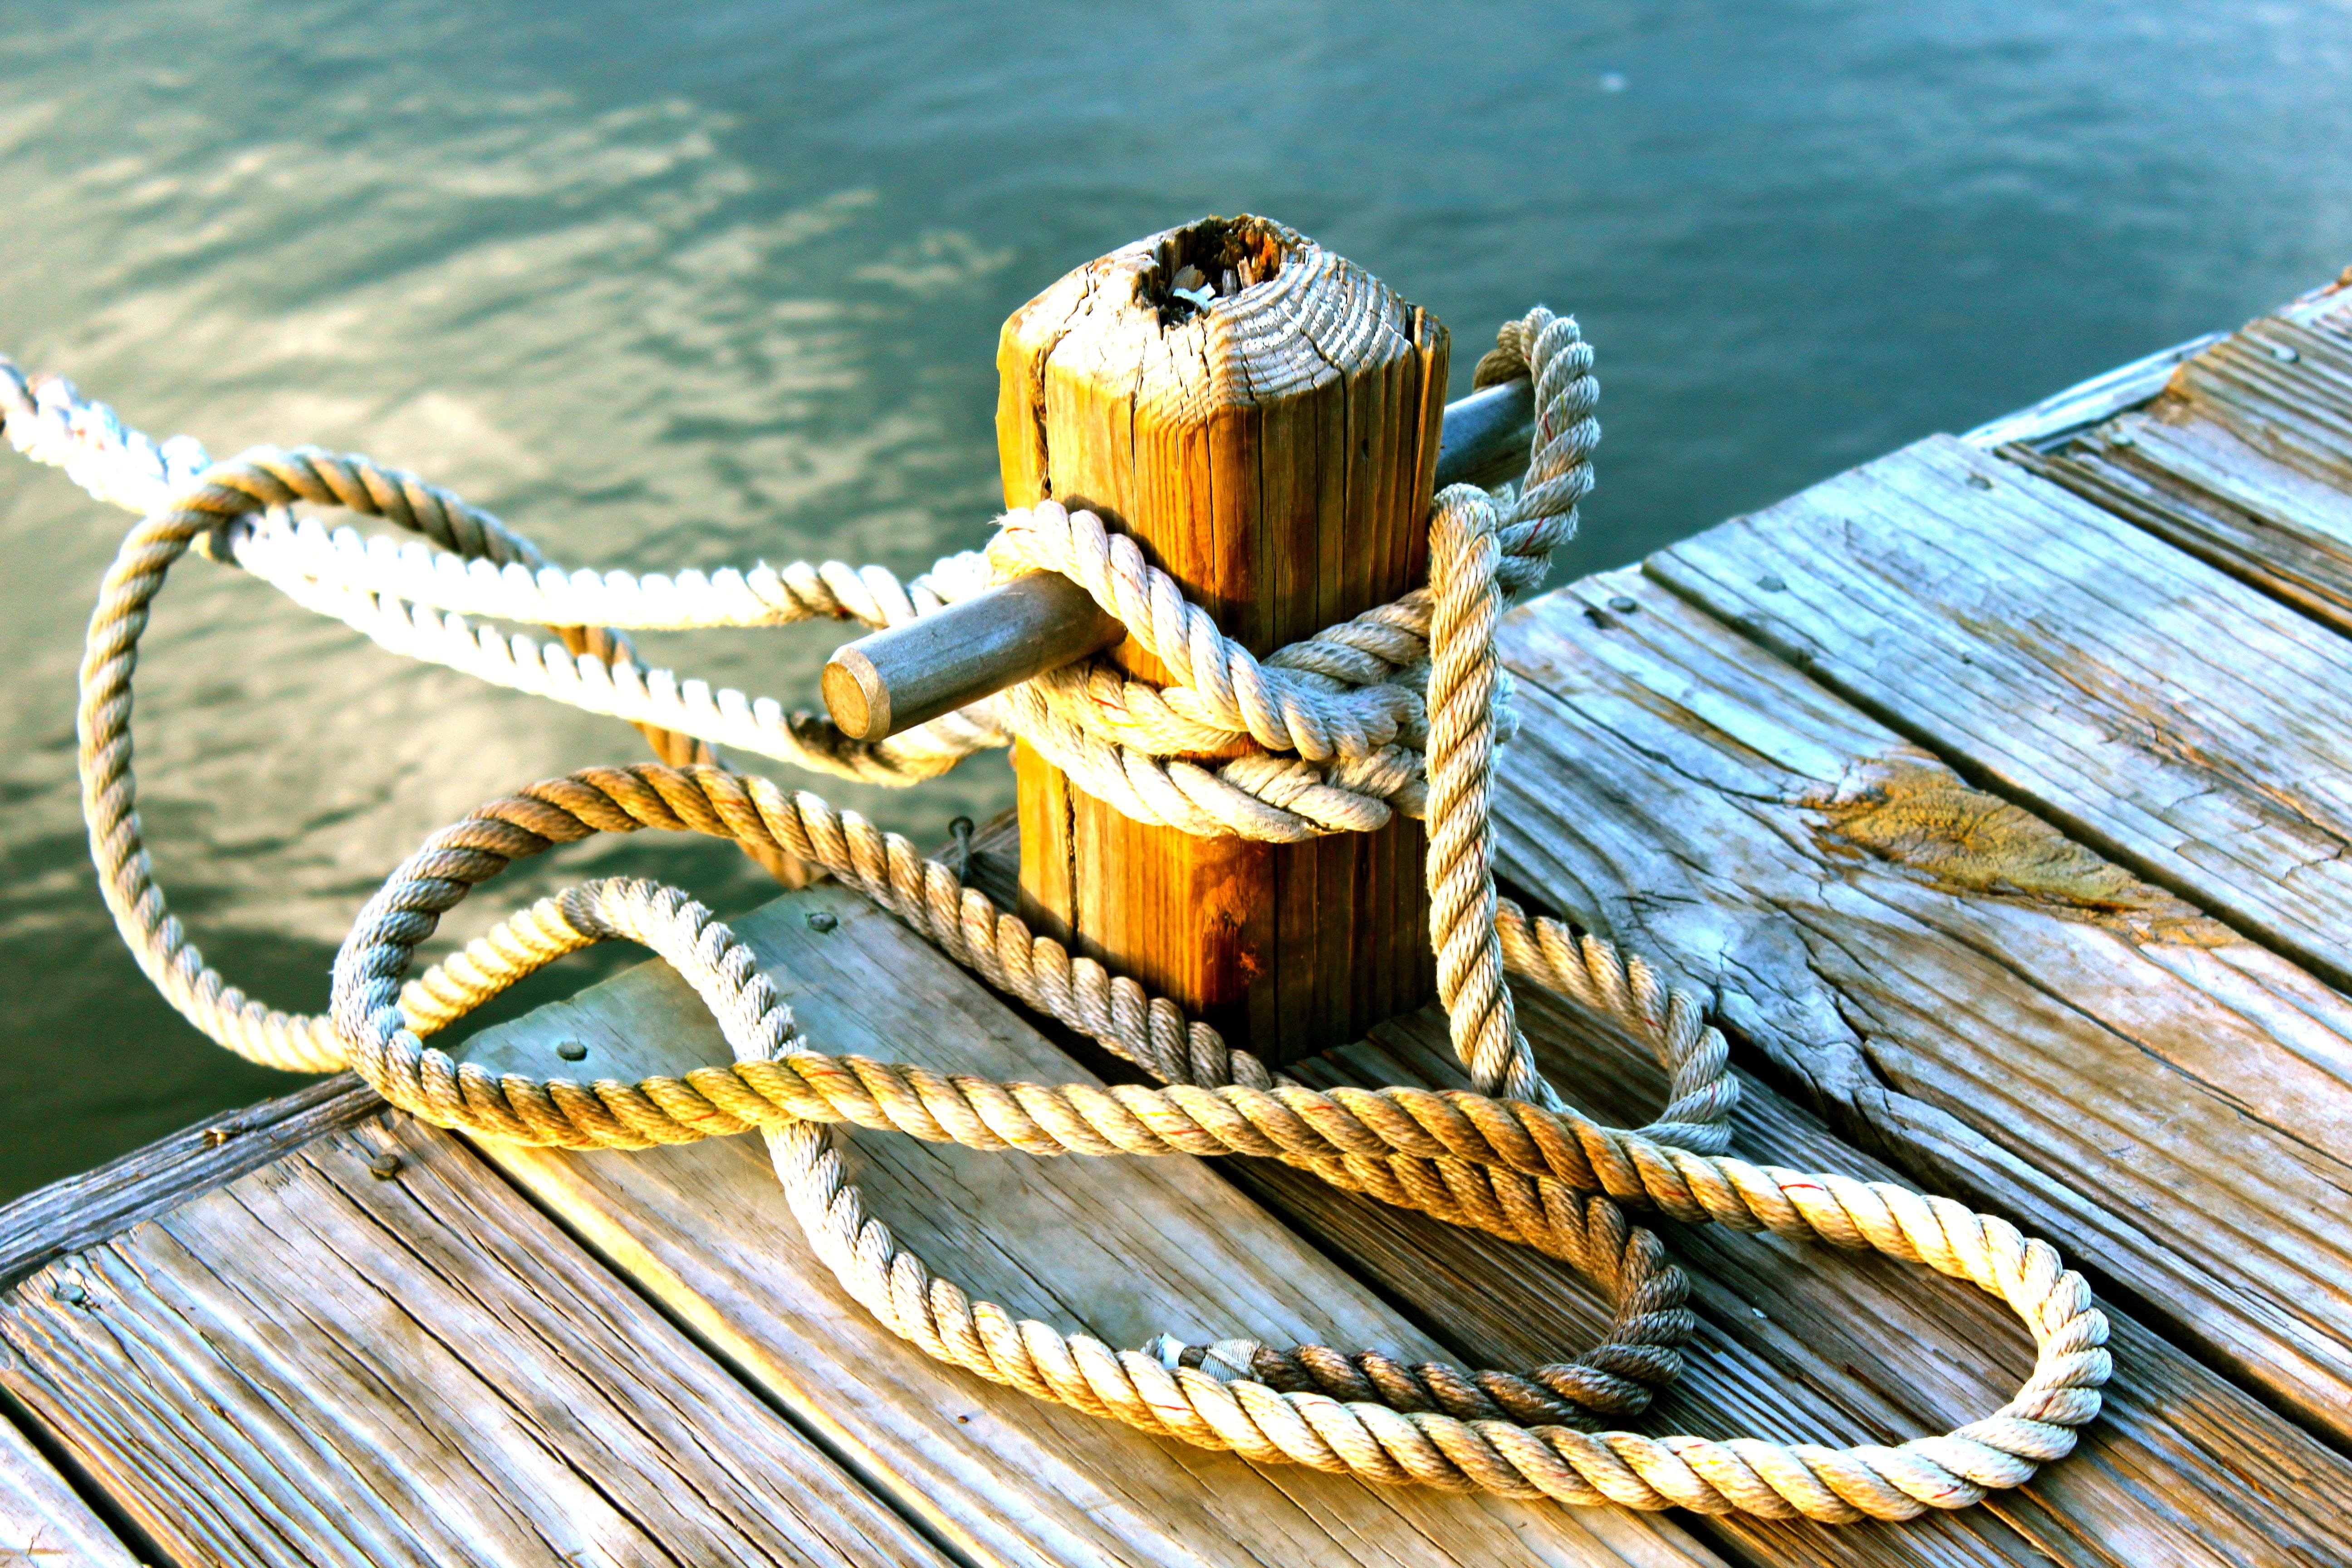 Marina Tie Up